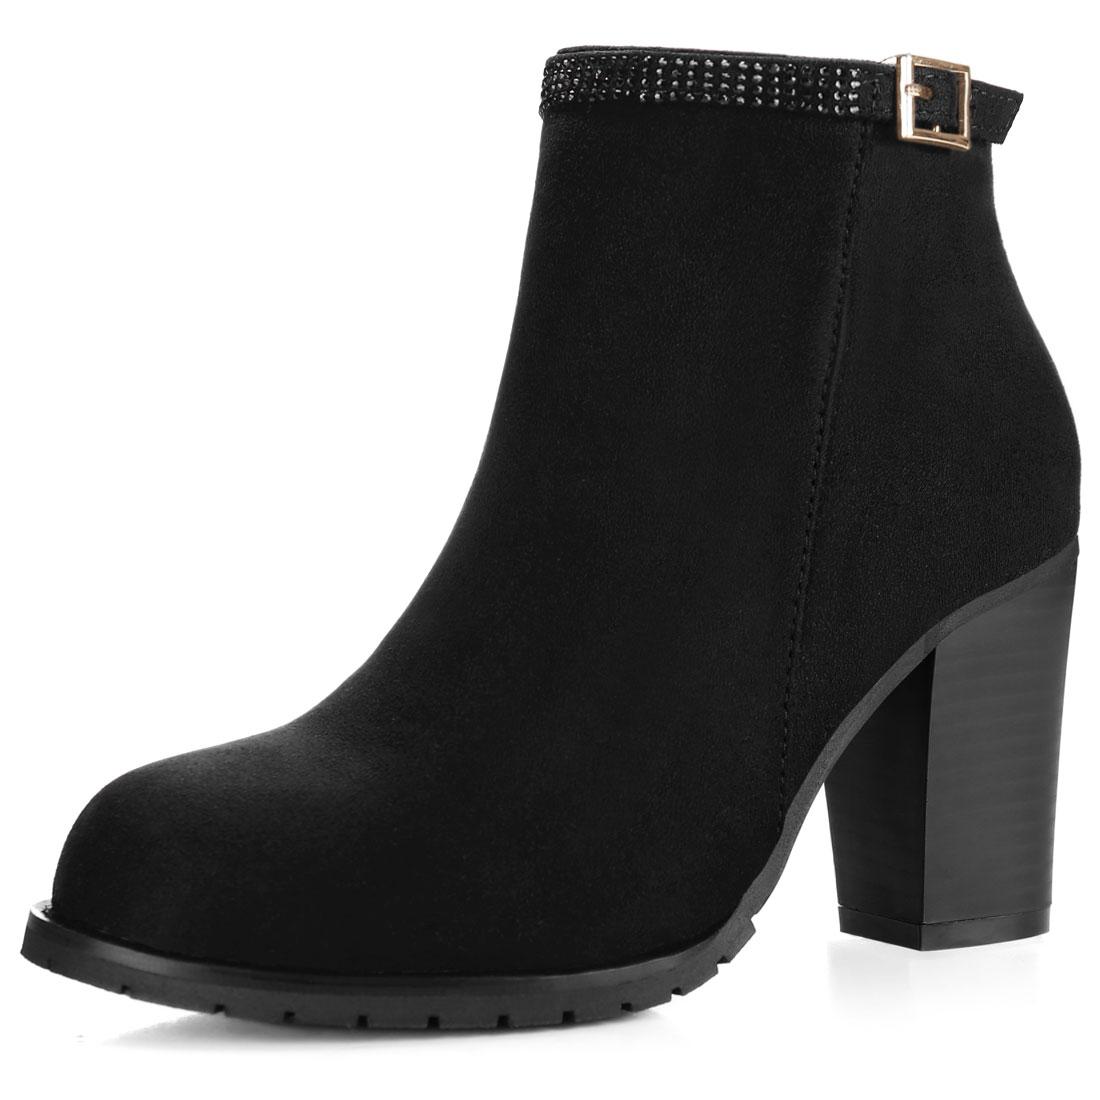 Women Rhinestone Strap Chunky High Heel Ankle Booties Black US 7